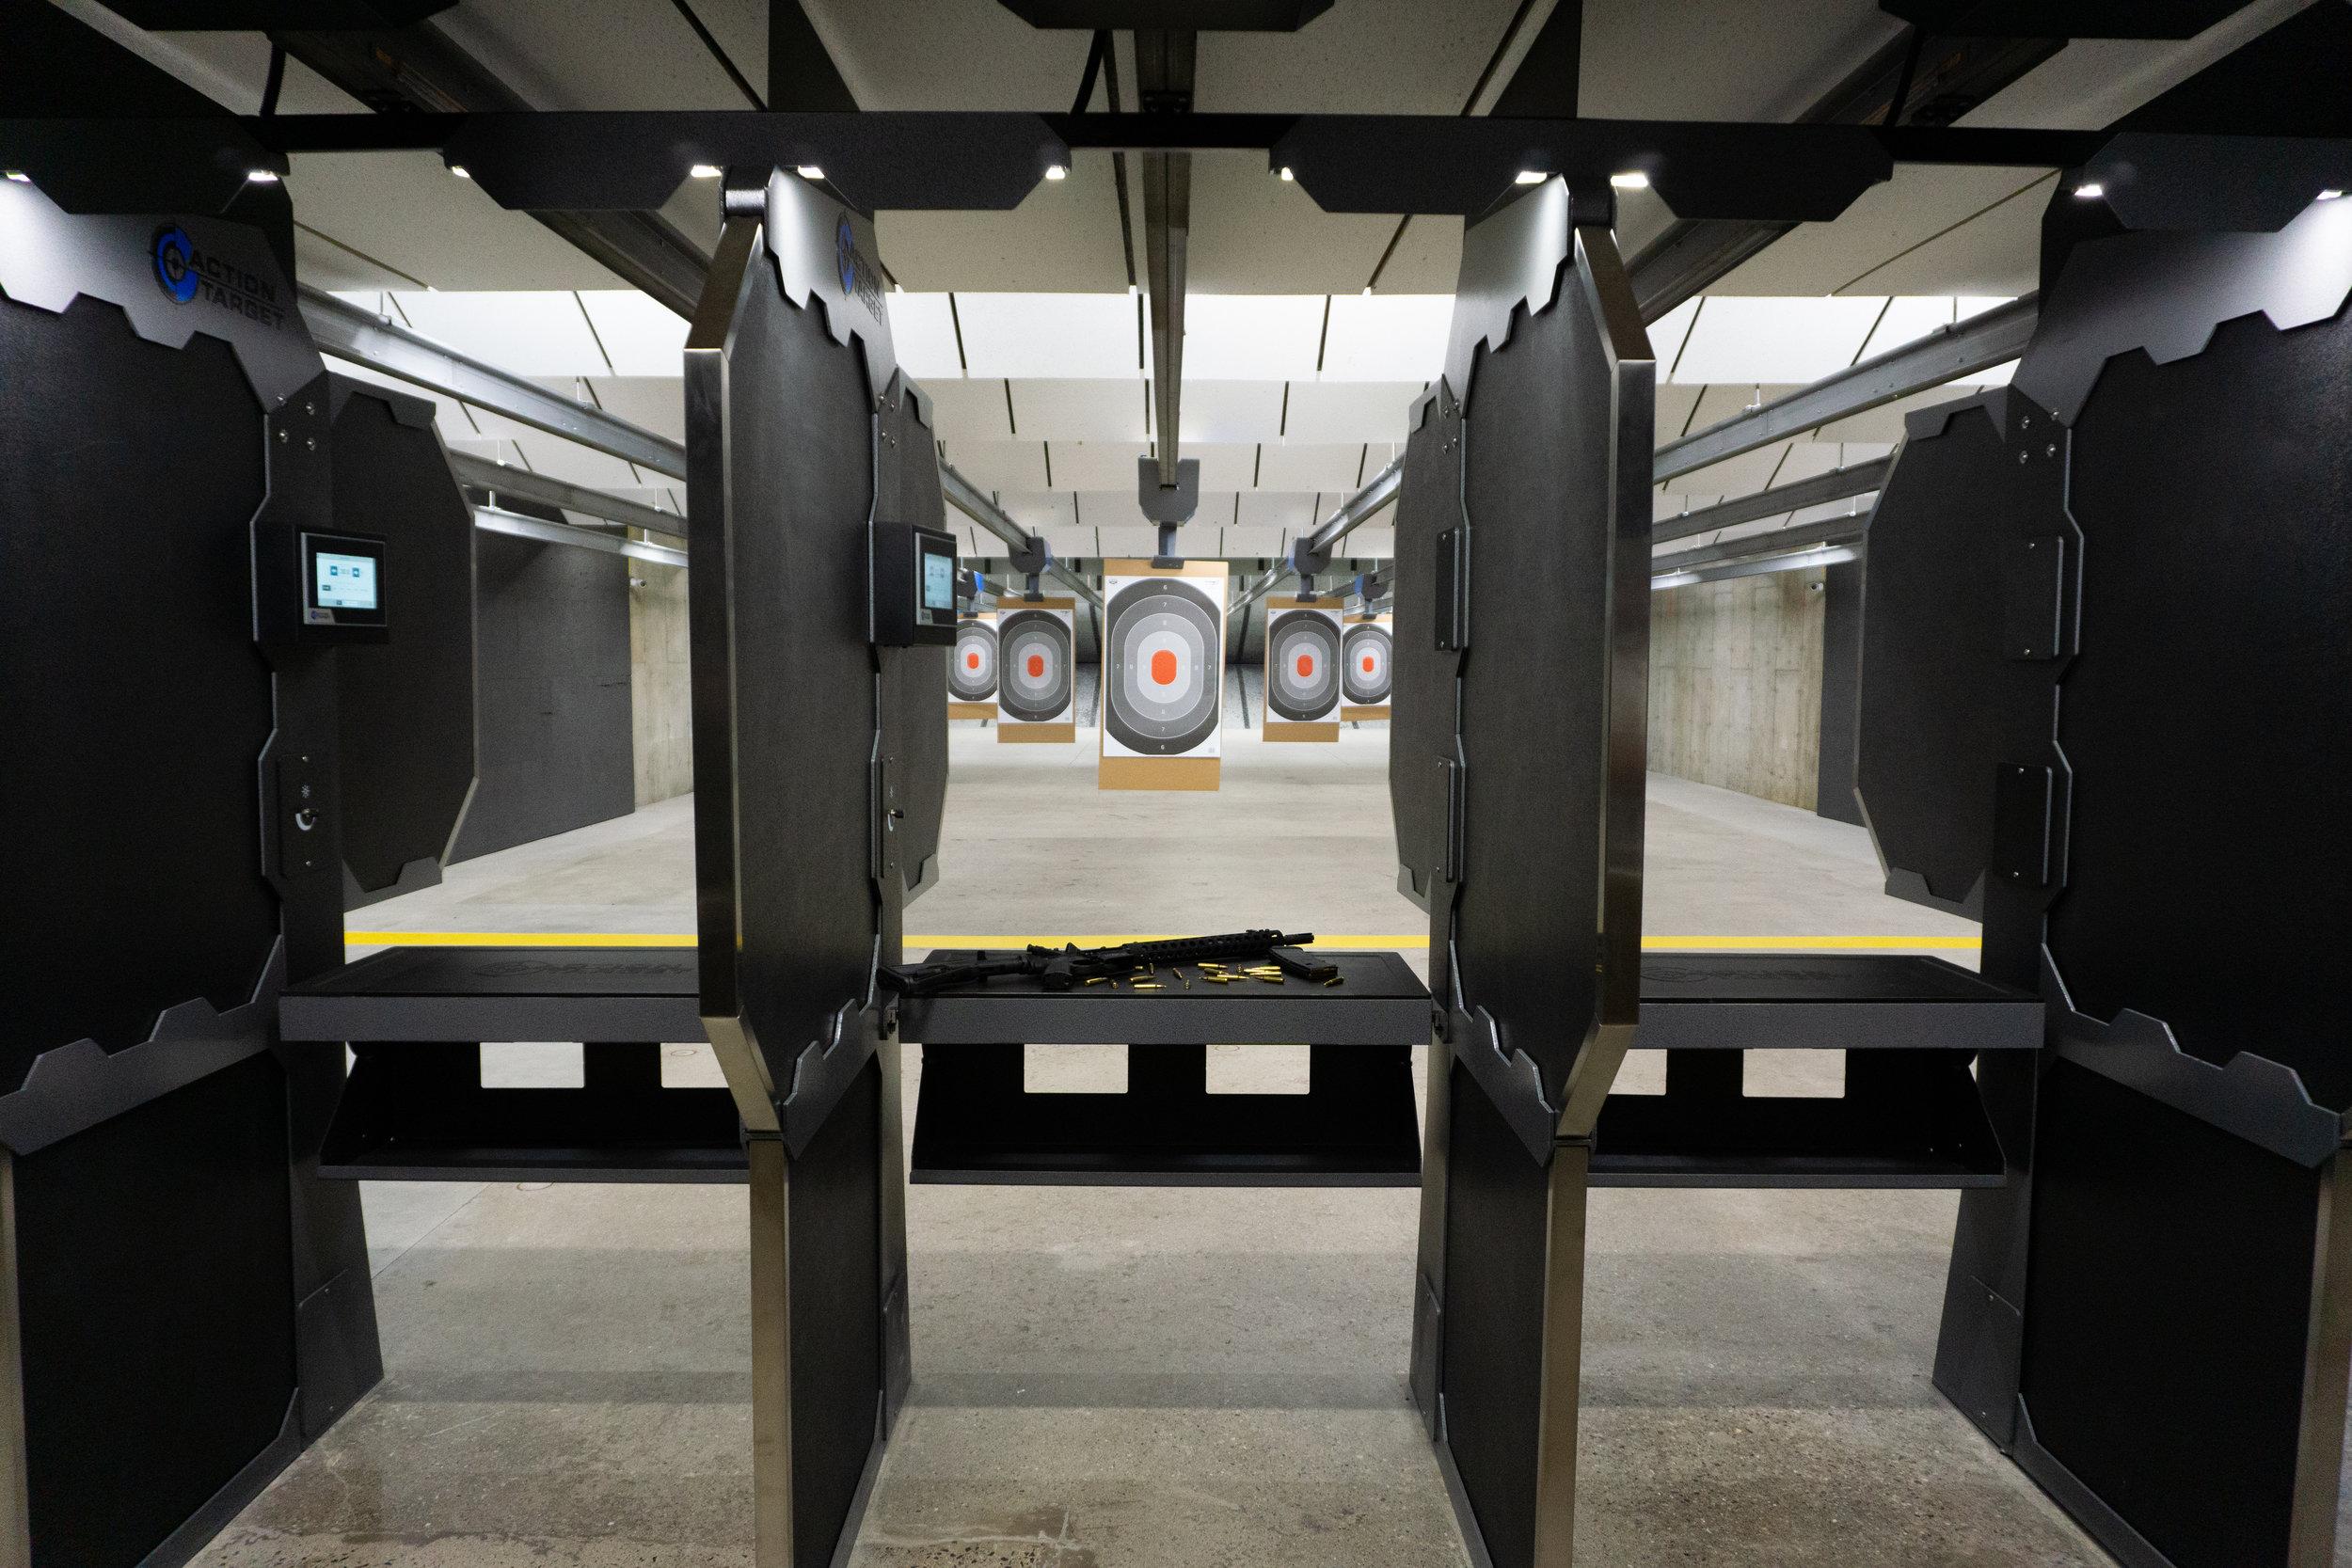 Springfield Gun Range | Hot Brass Range